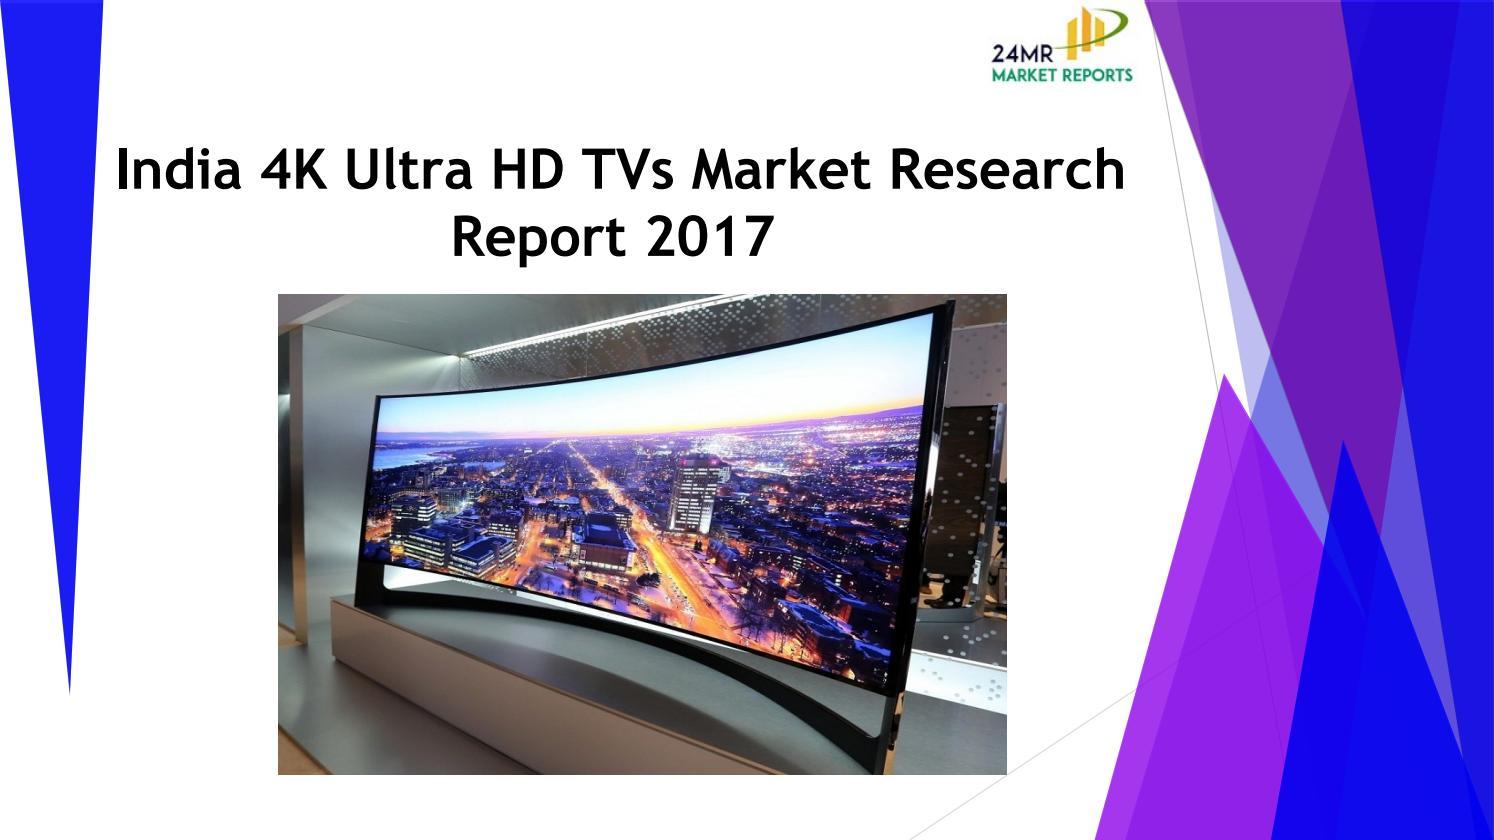 05e23789d491 24 Market Reports  India 4K Ultra HD TVs Market Research Report 2017 by  Vansh Rao - issuu